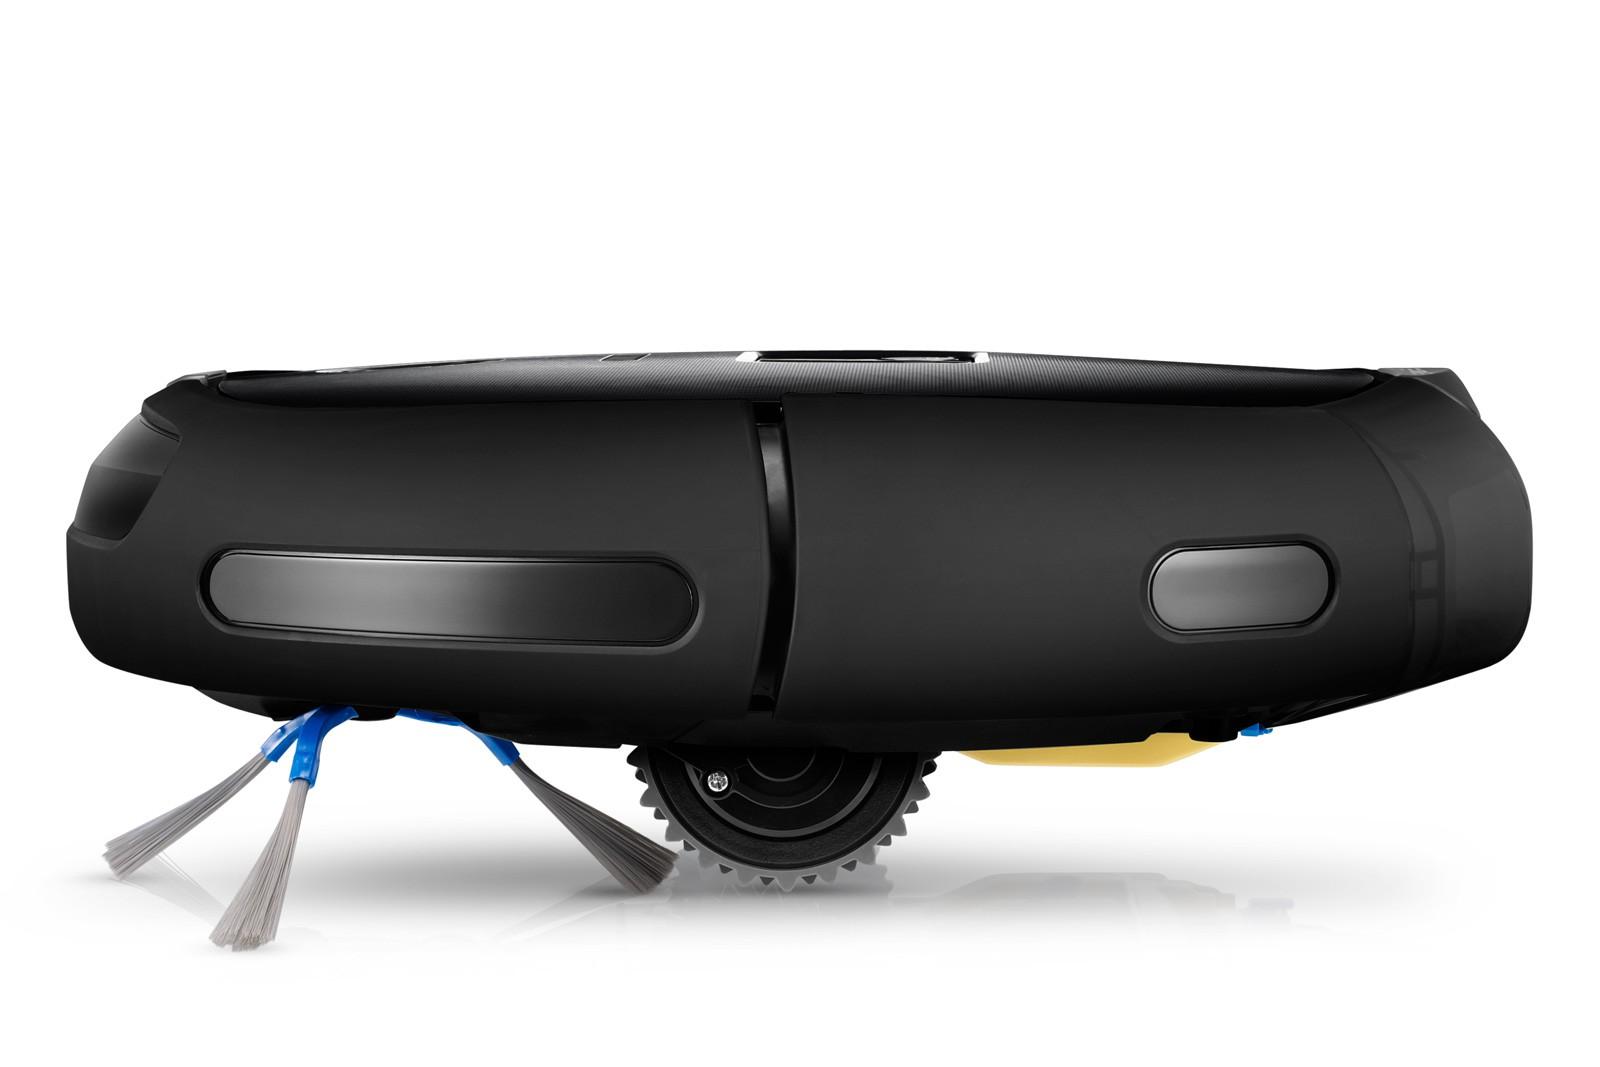 solde aspirateur dyson solde aspirateur sans sac dyson. Black Bedroom Furniture Sets. Home Design Ideas